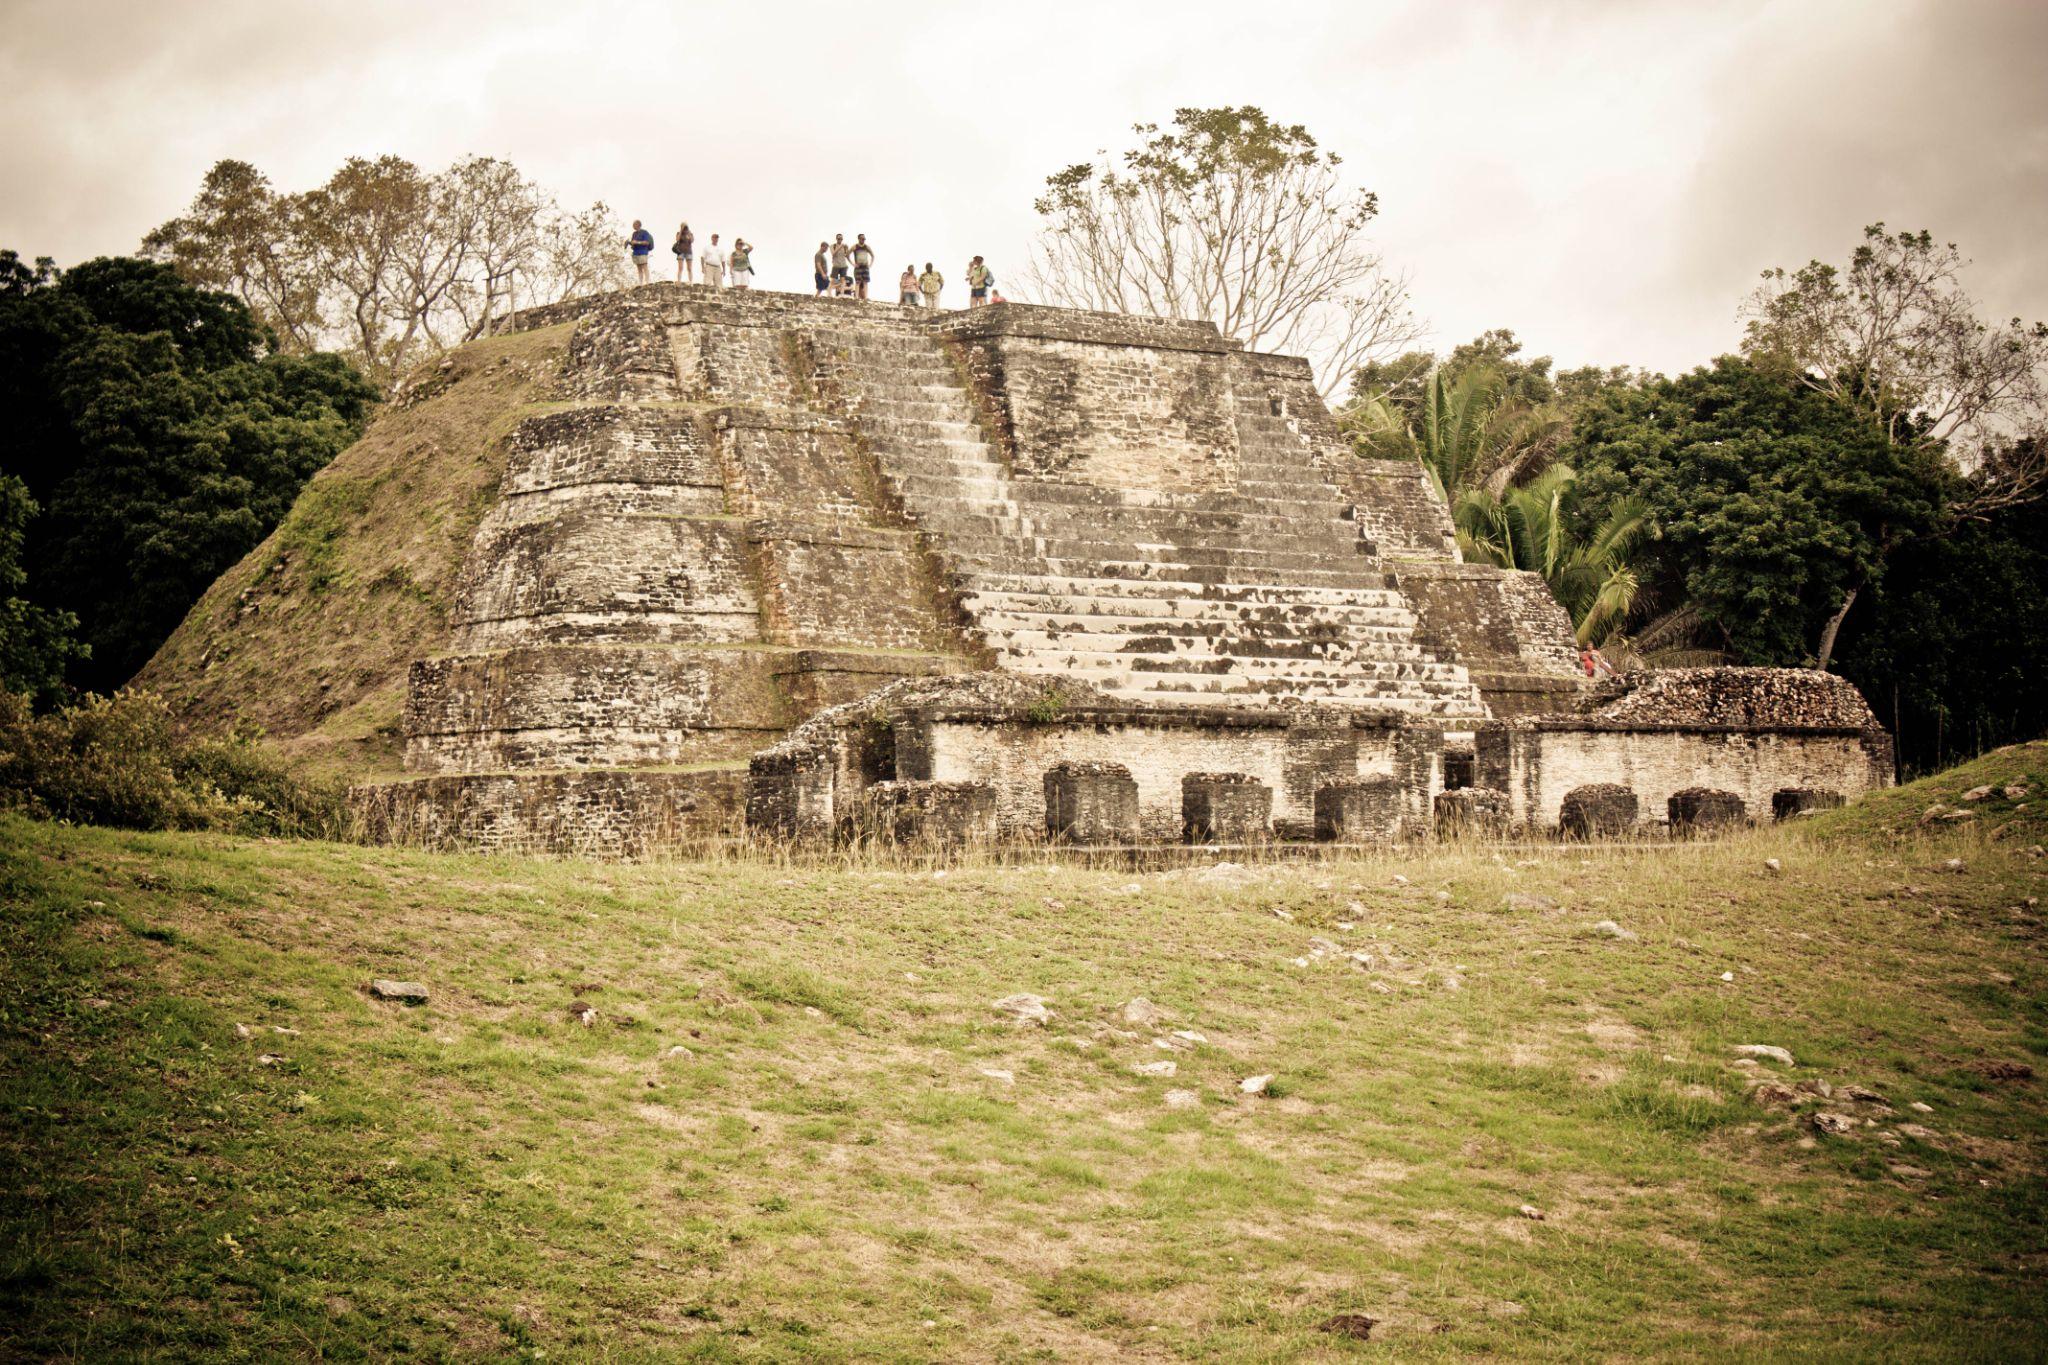 Mayan Ruins by Jason Saint-Elie